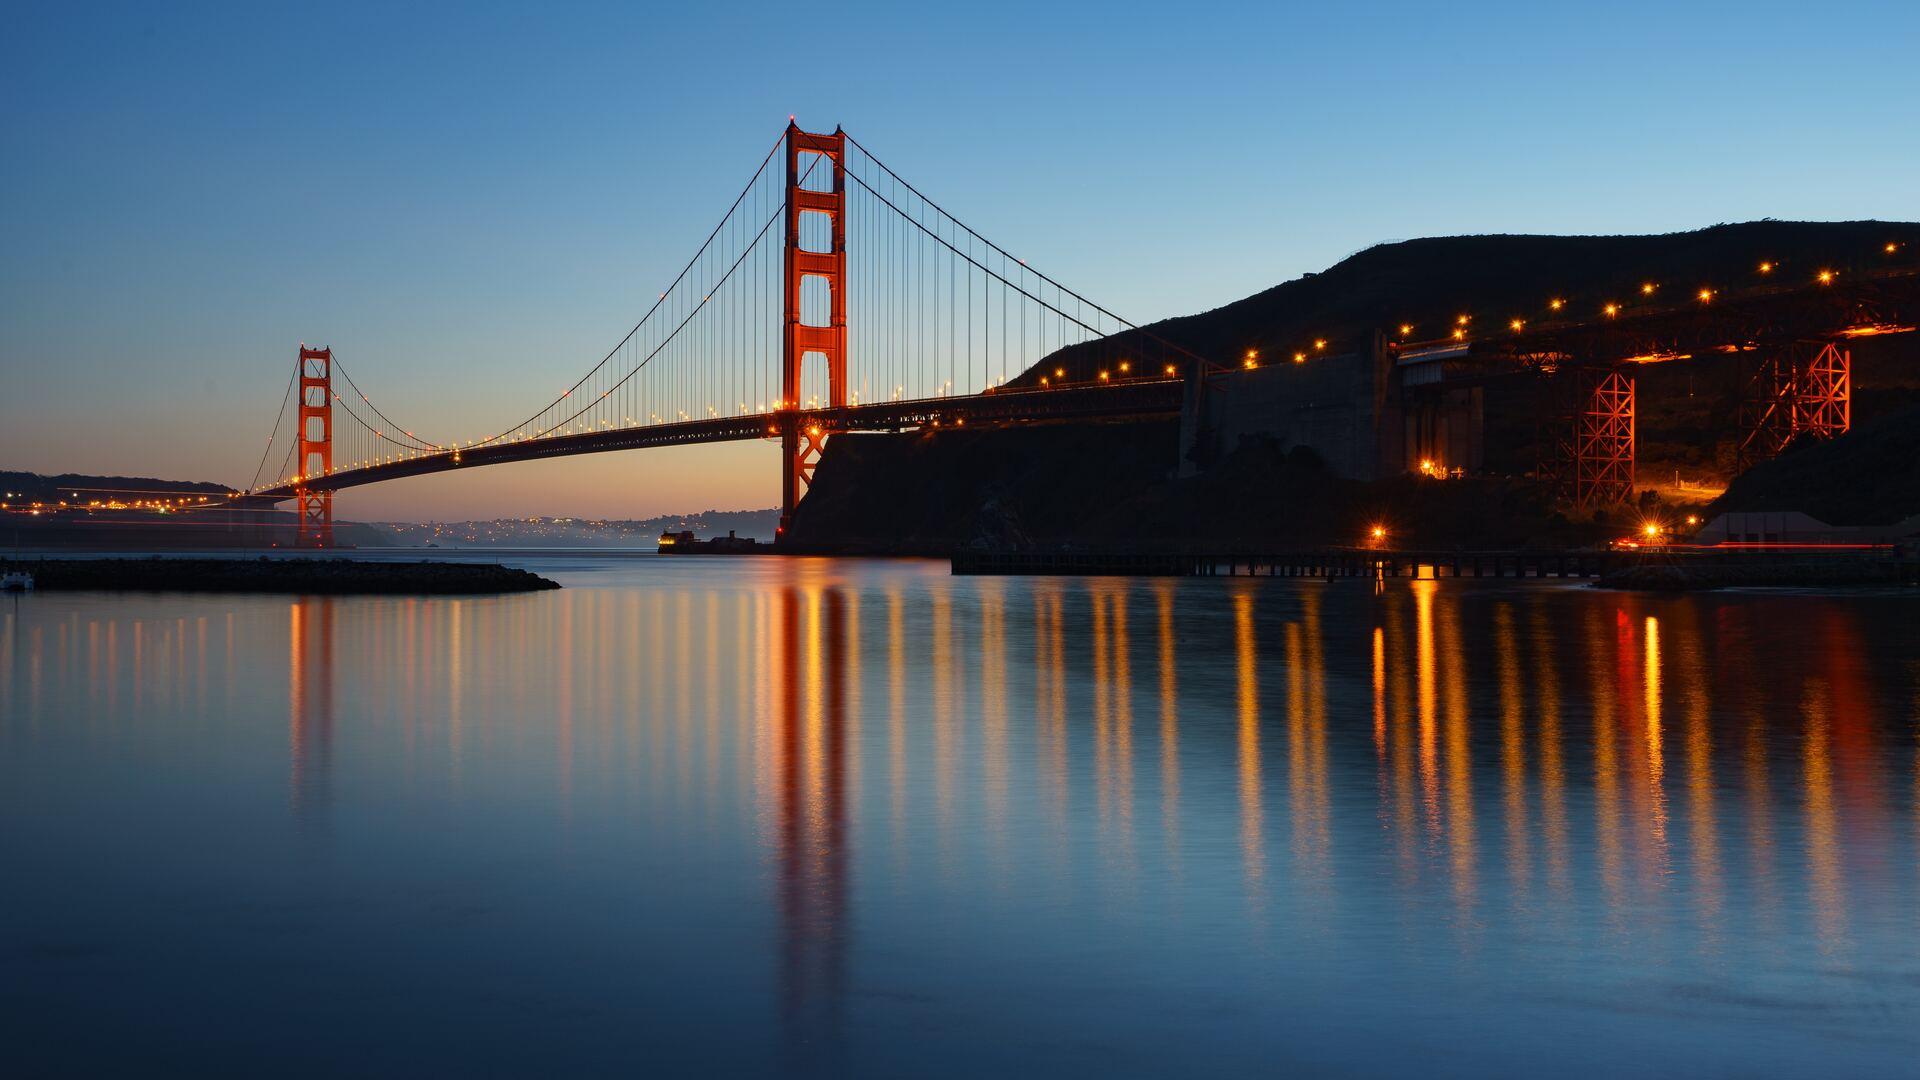 1920x1080 Golden Gate Bridge Evening 5k Laptop Full Hd 1080p Hd 4k